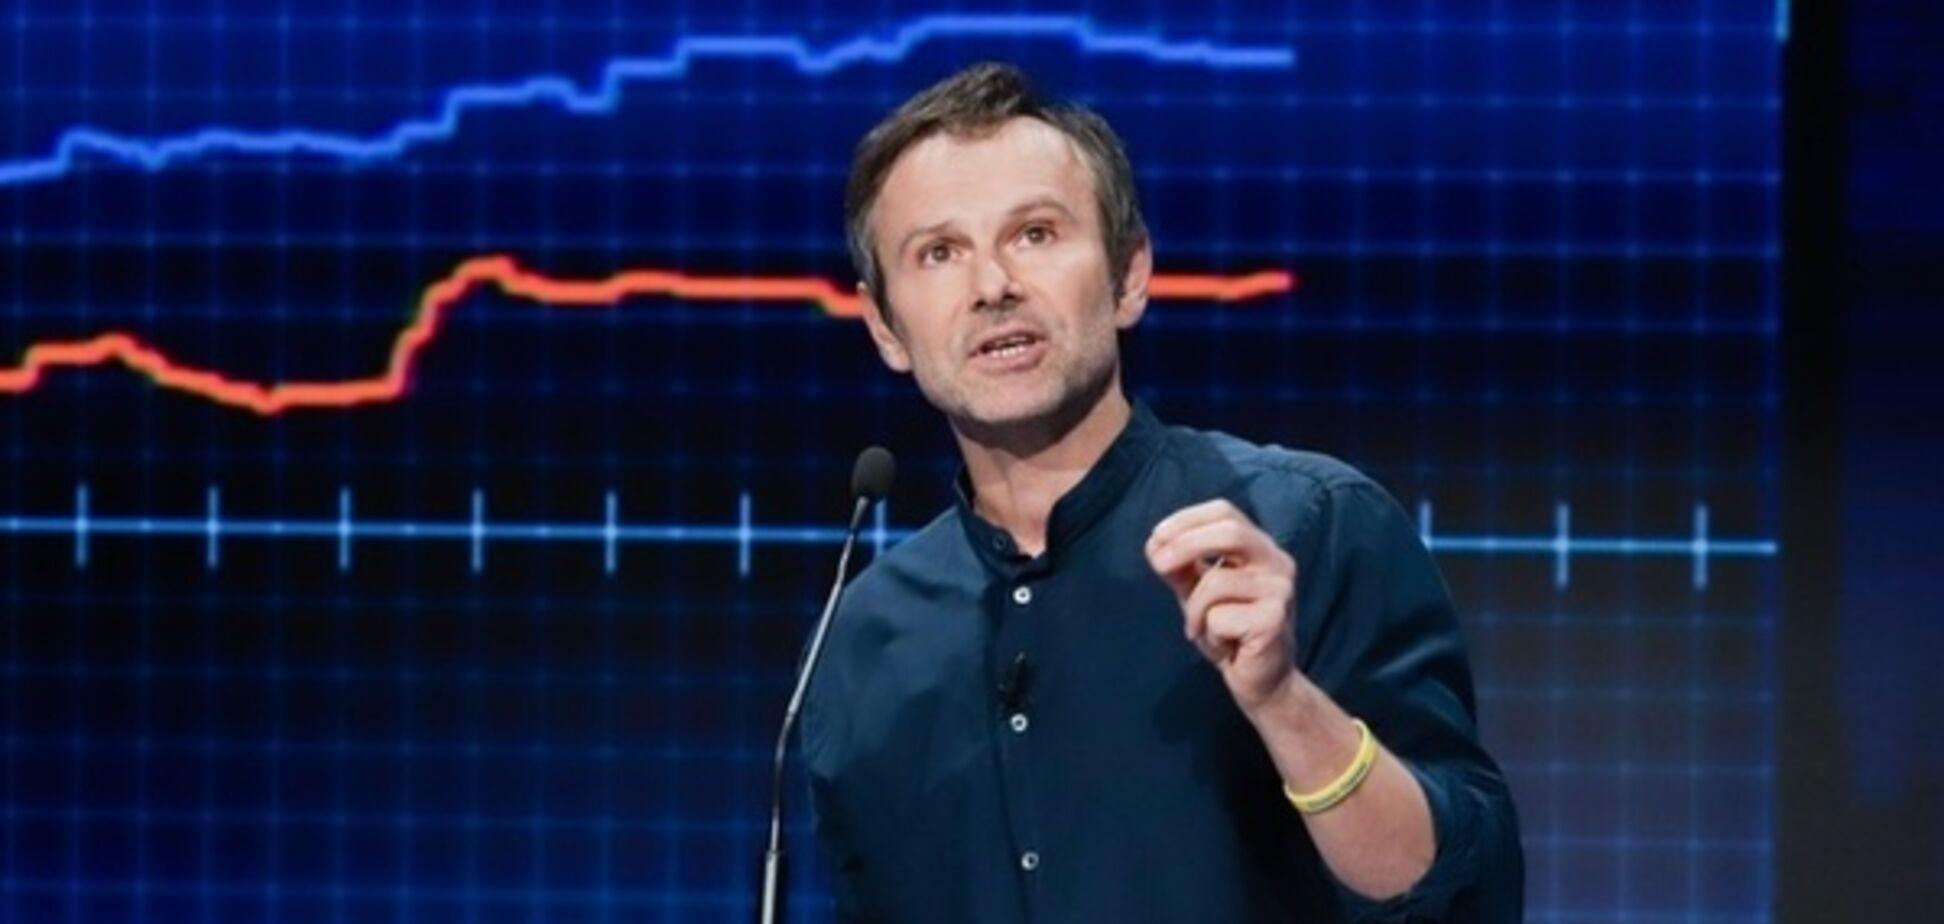 Вакарчук предложил альтернативу Минским соглашениям